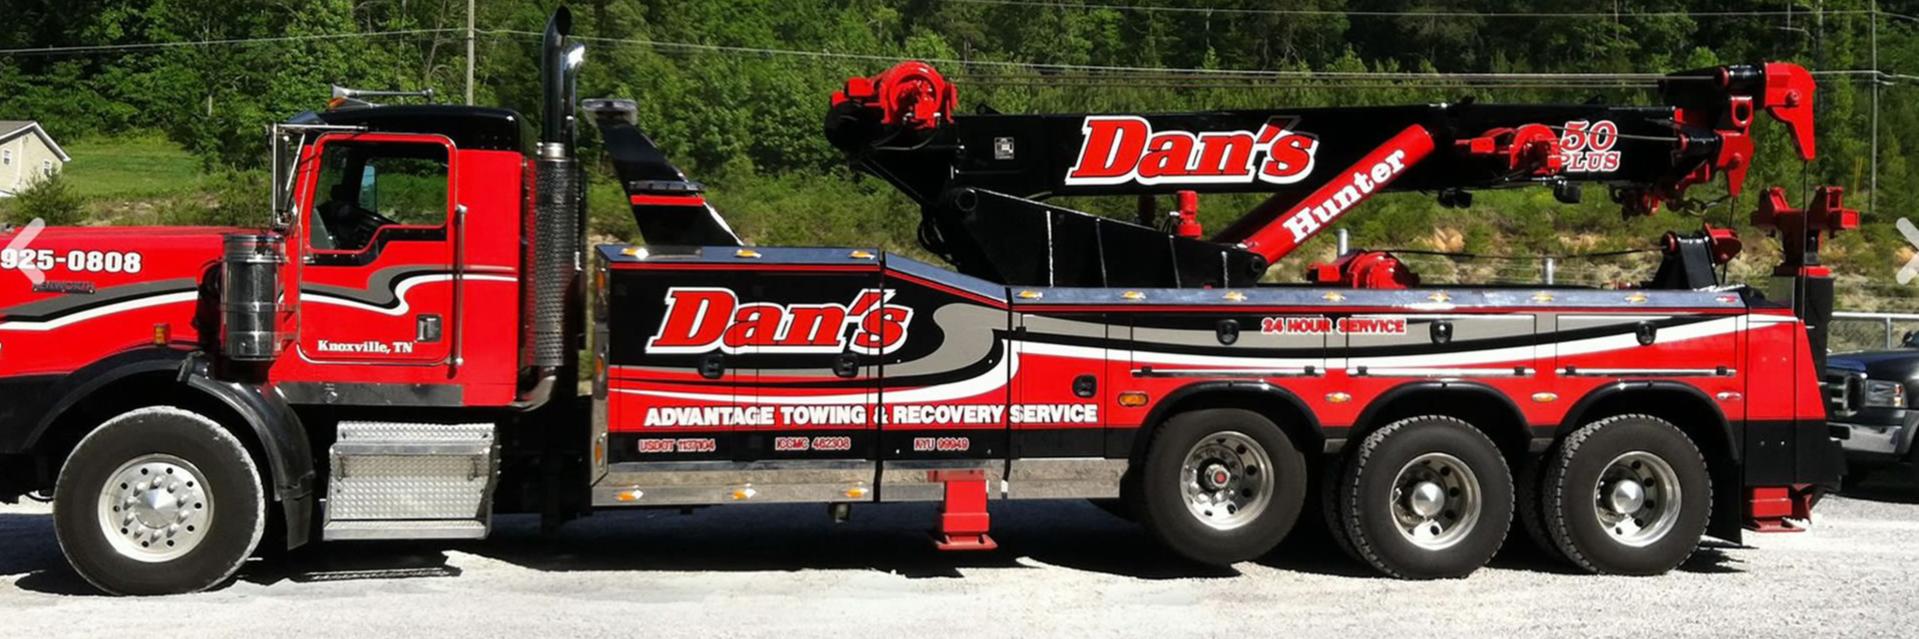 Dan's Advantage Towing Towing.com Profile Banner